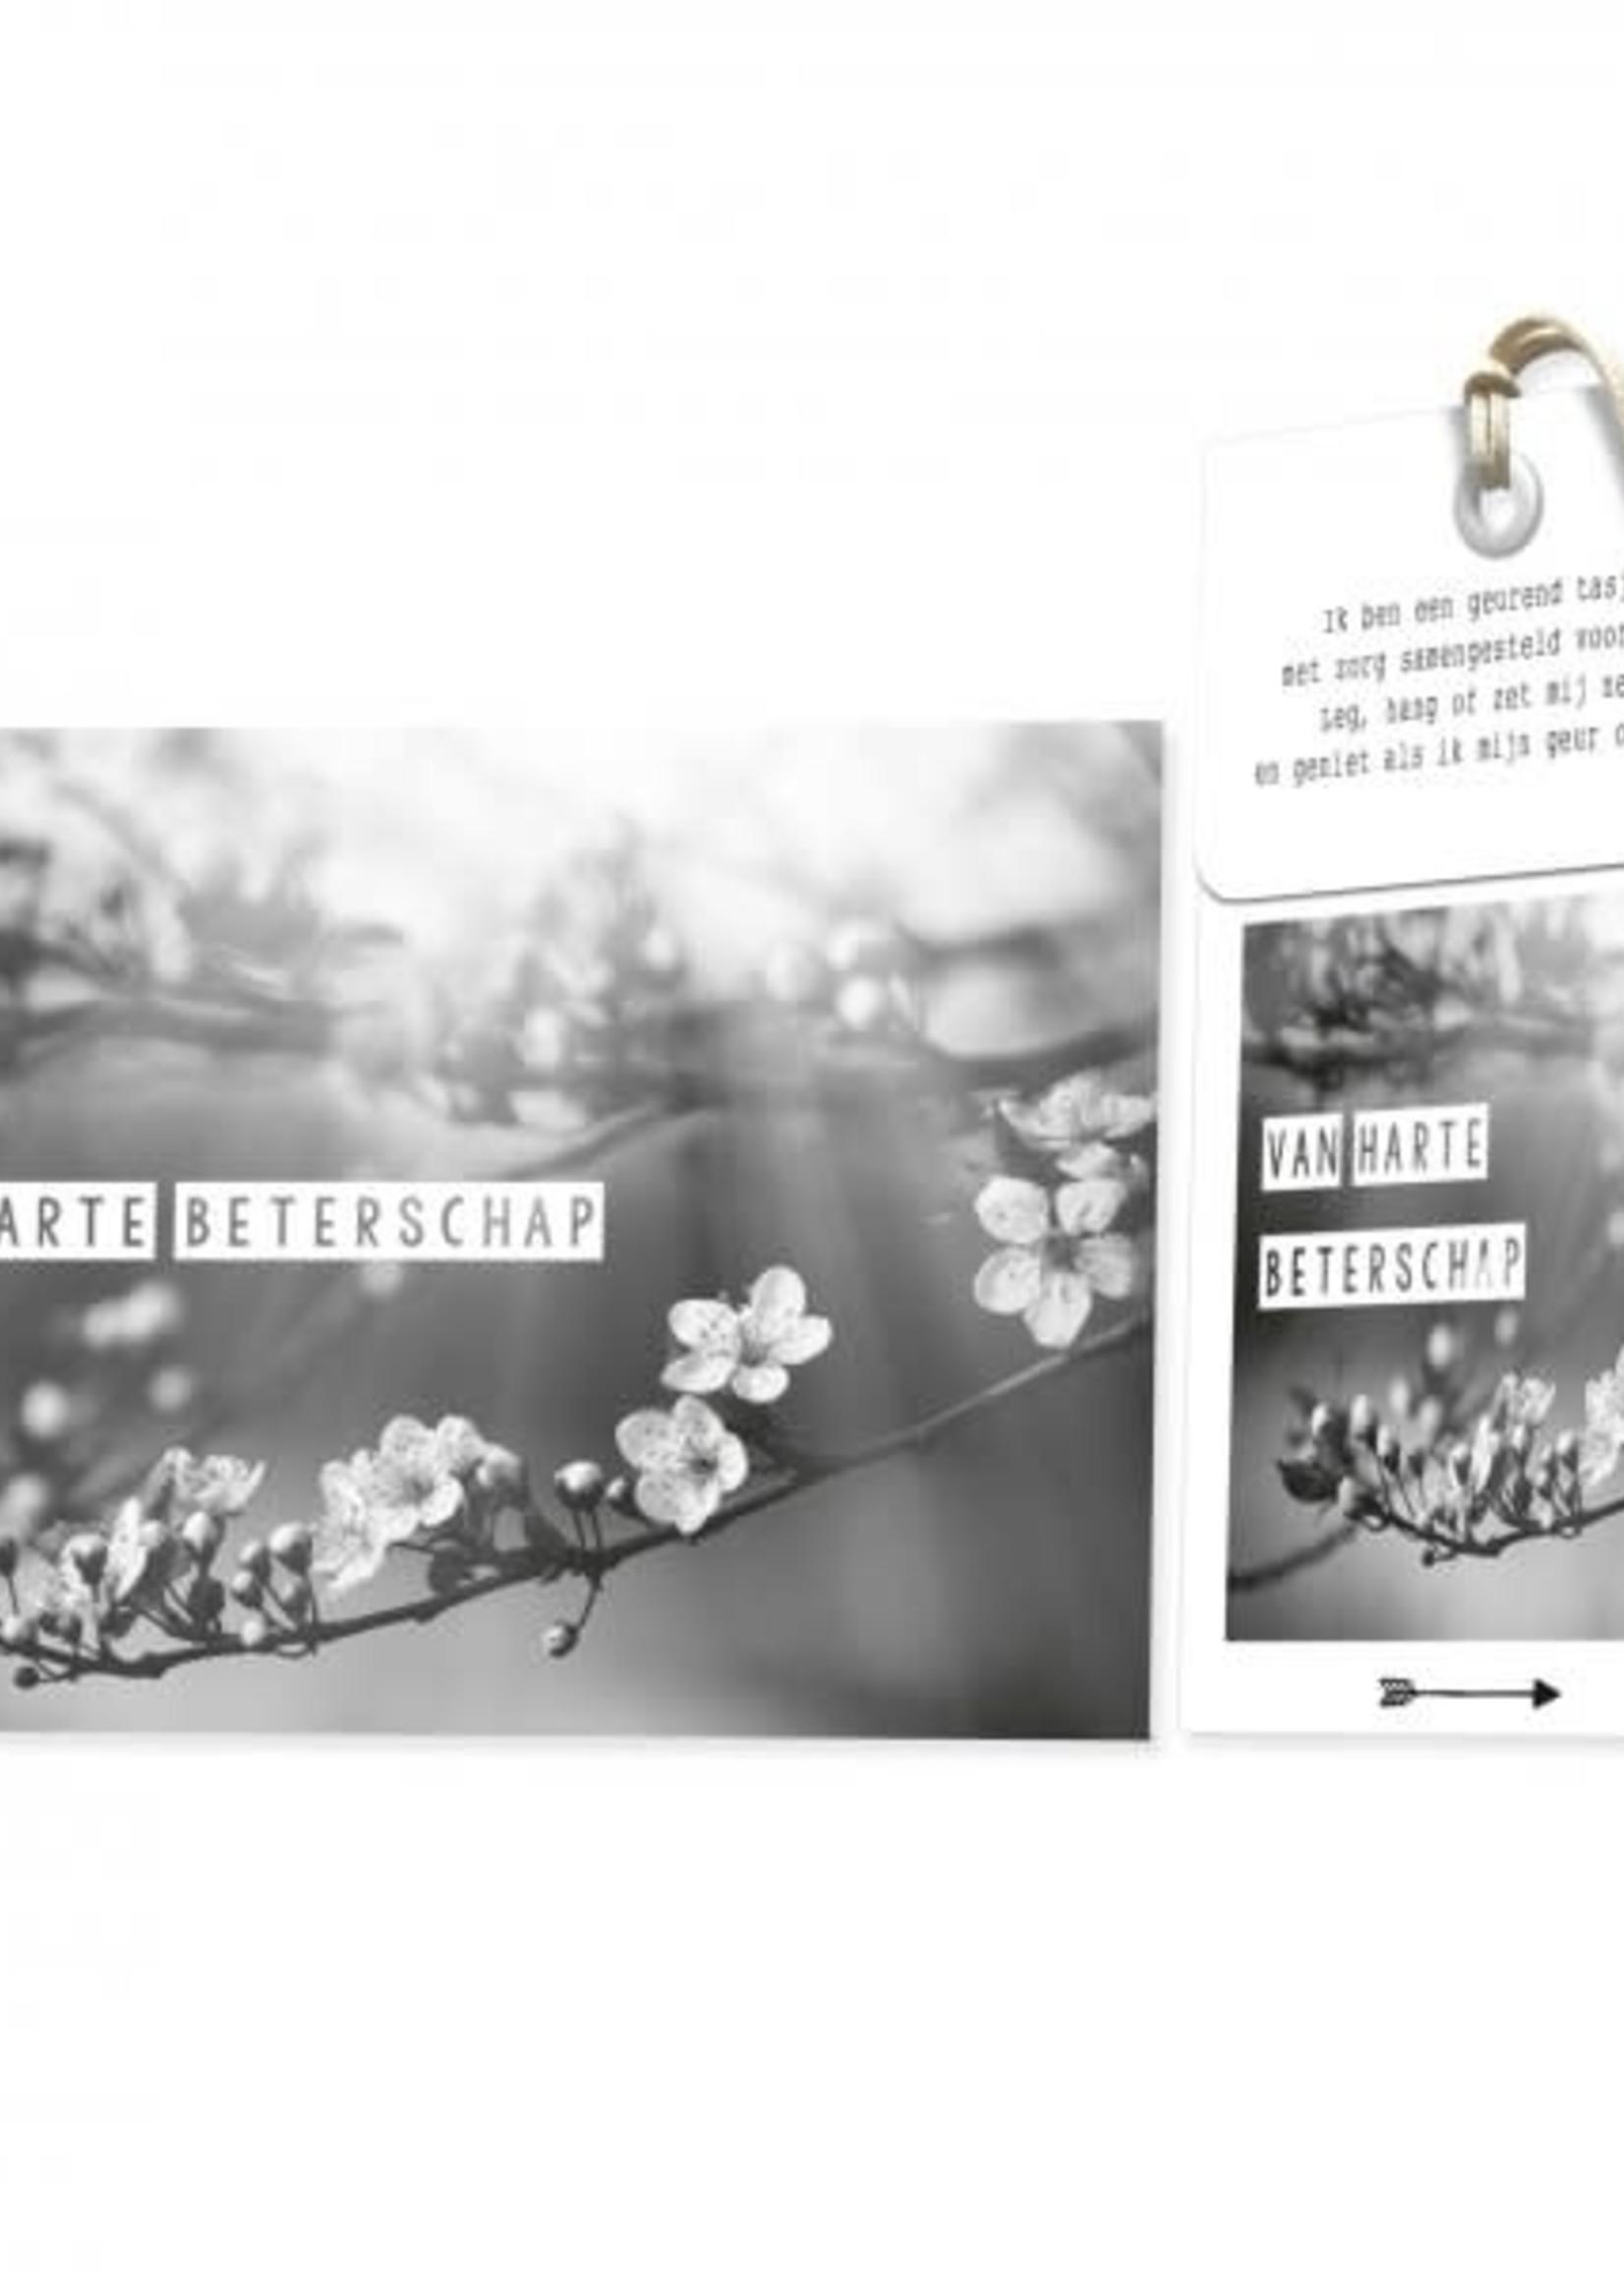 FLOWERCARDS Geurwenskaart  Van harte beterschap